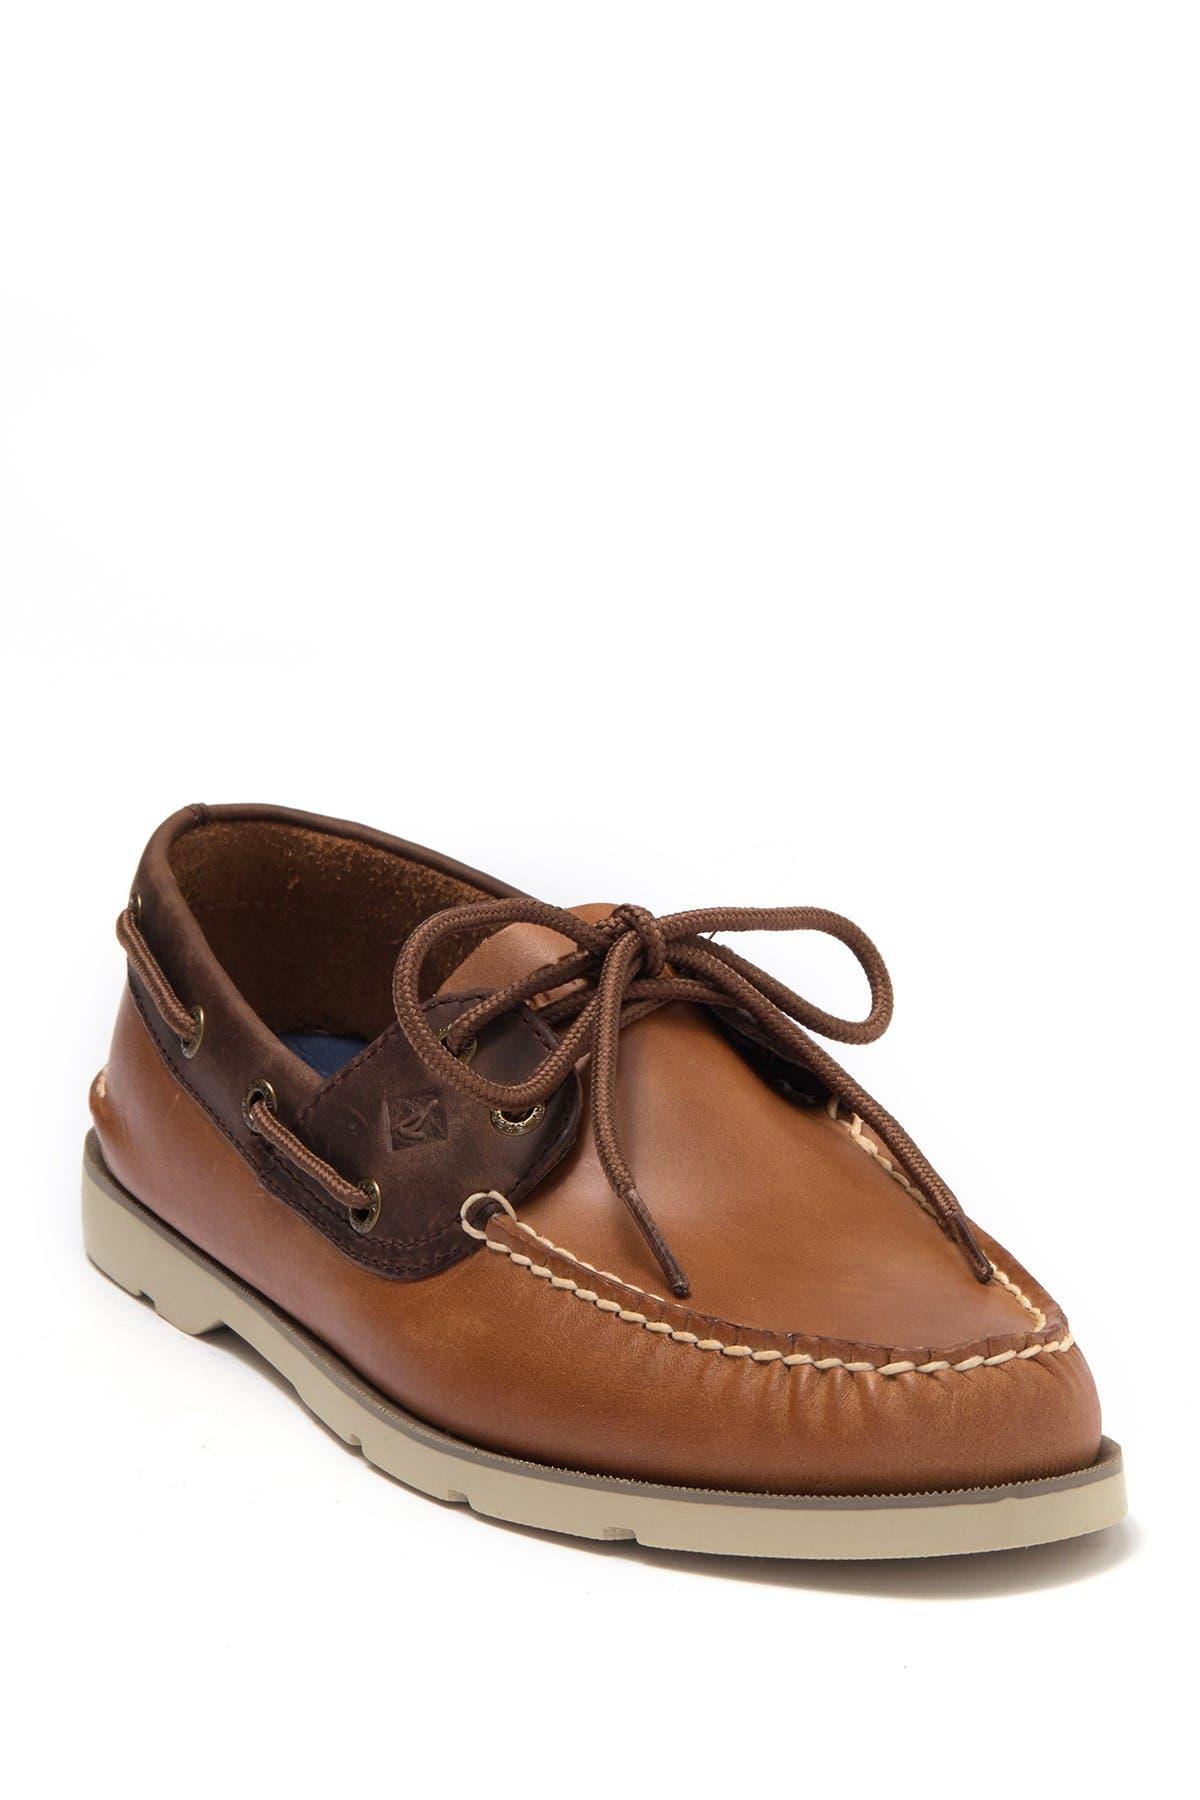 Image of Sperry Leeward 2-Eye Leather Boat Shoe